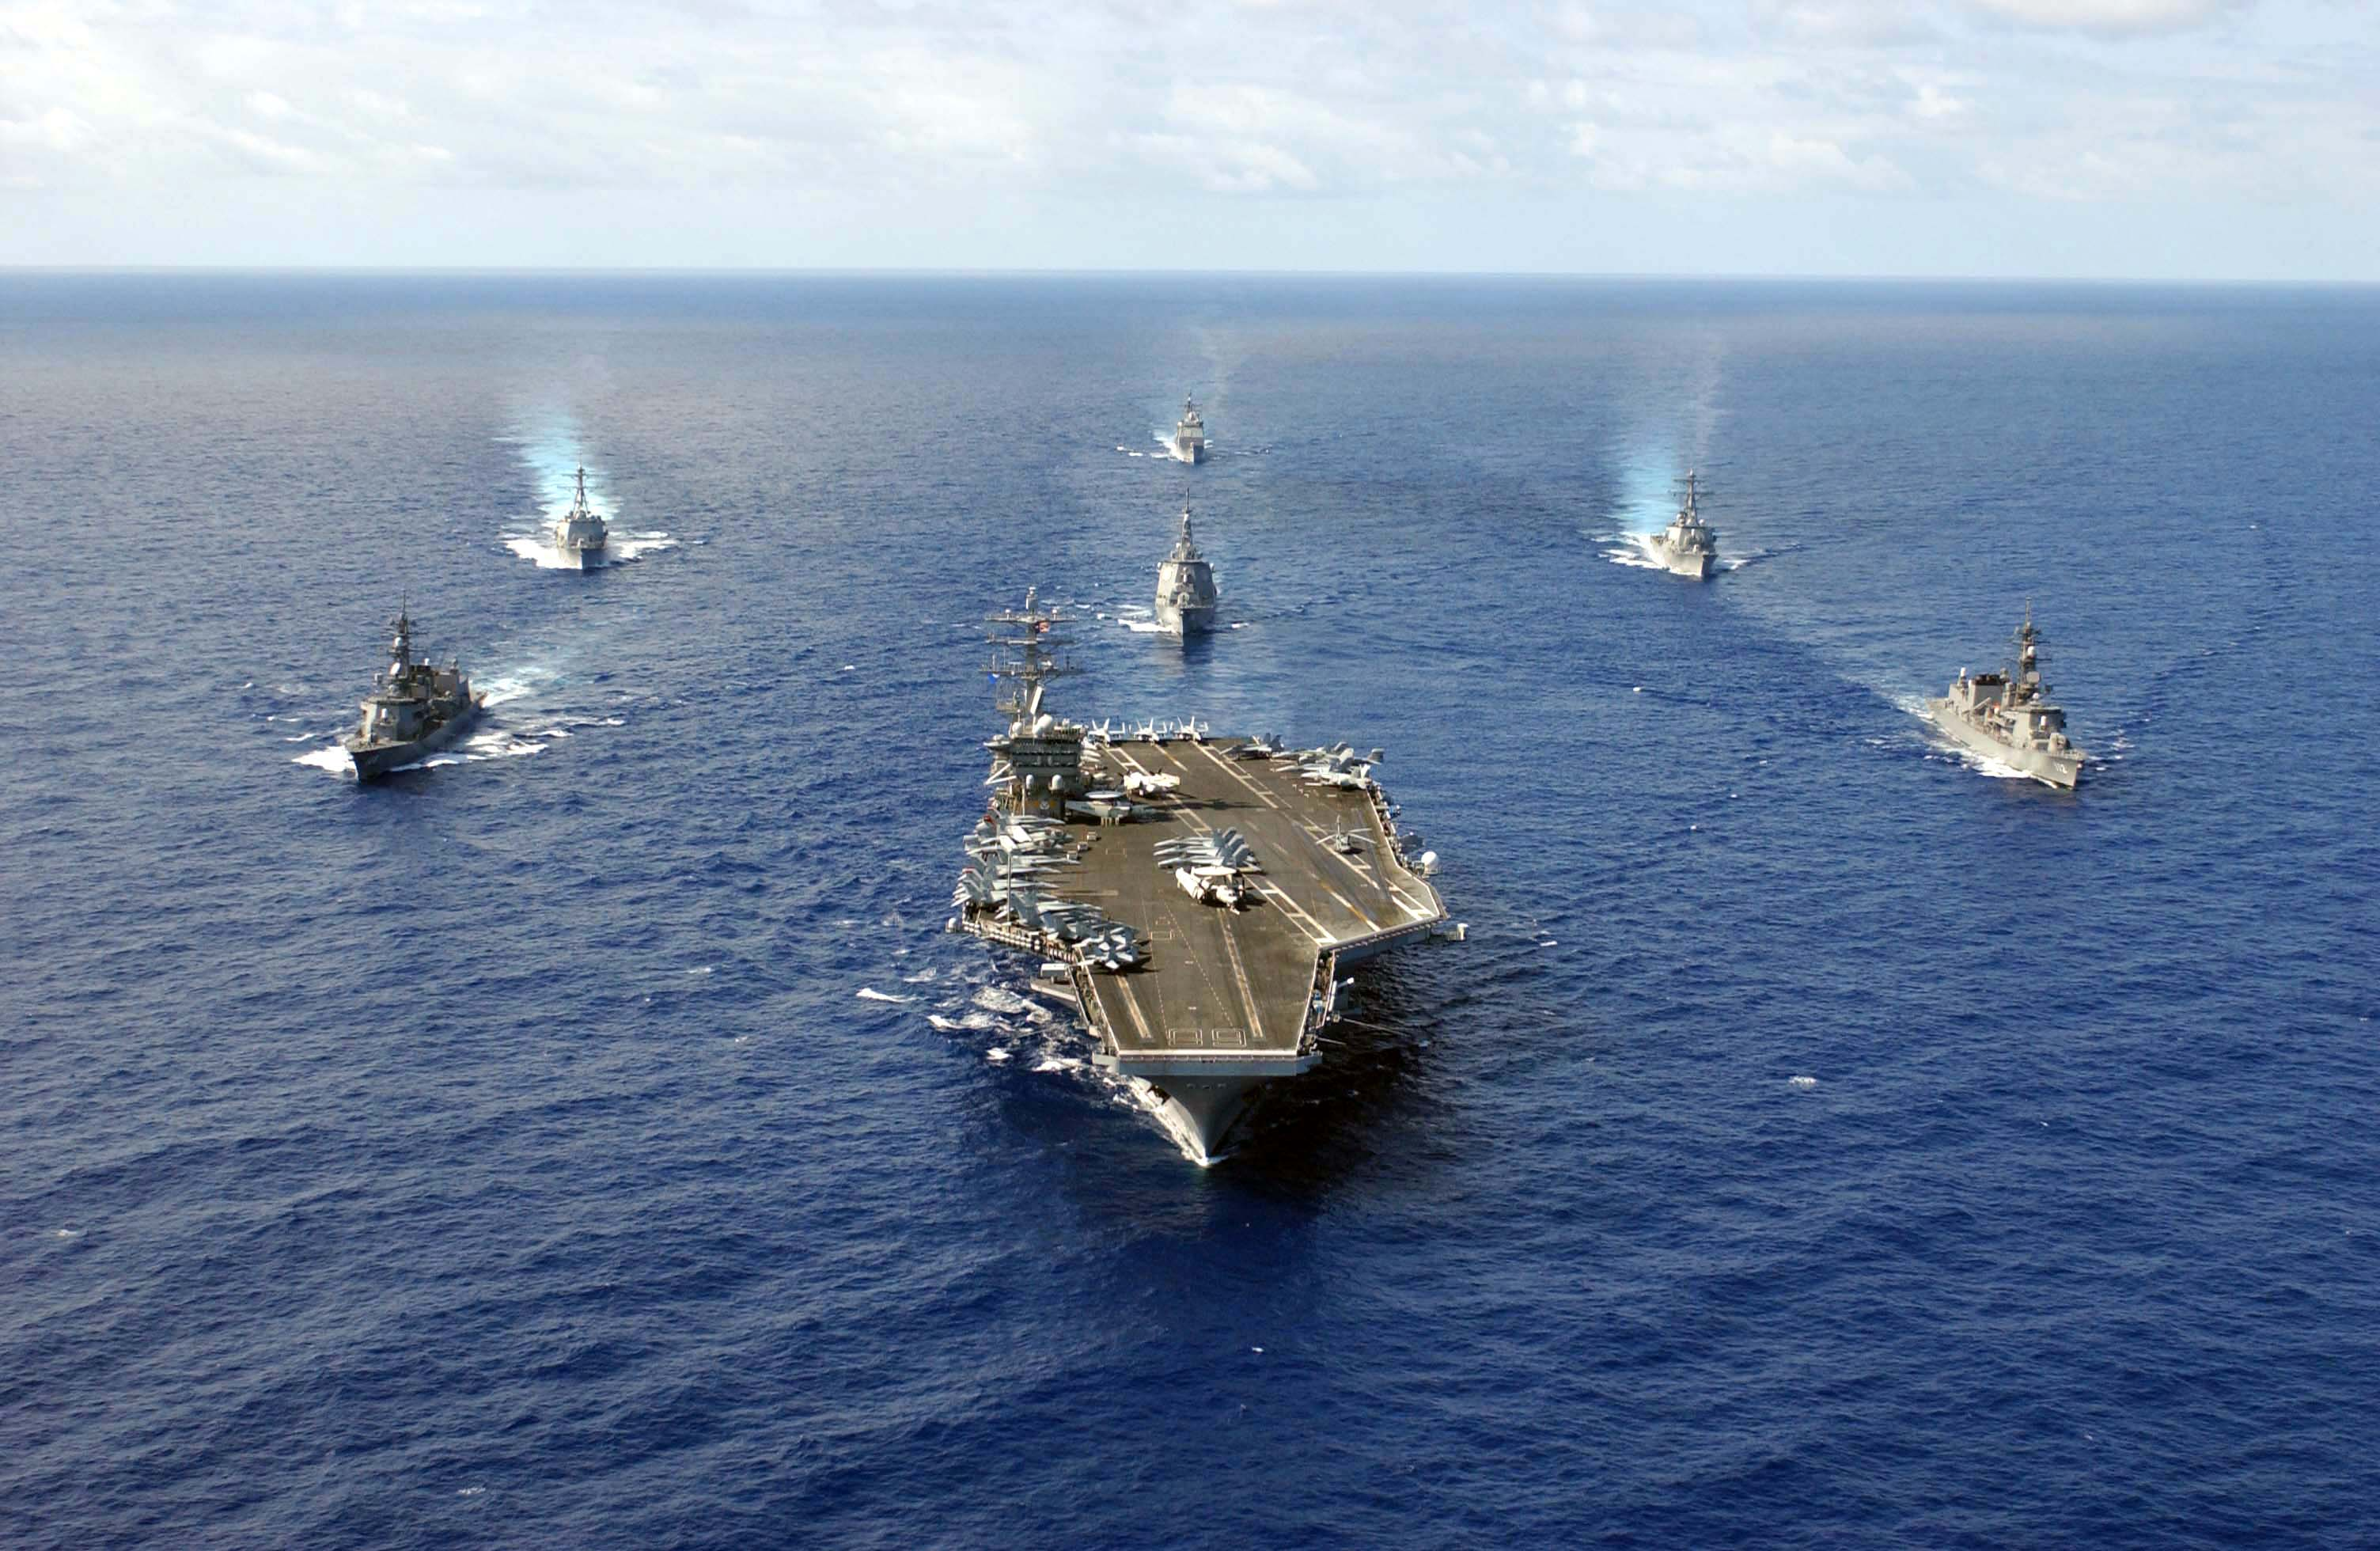 US Deploys Two More Aircraft Carrier Strike Groups Toward Korean Peninsula: Media